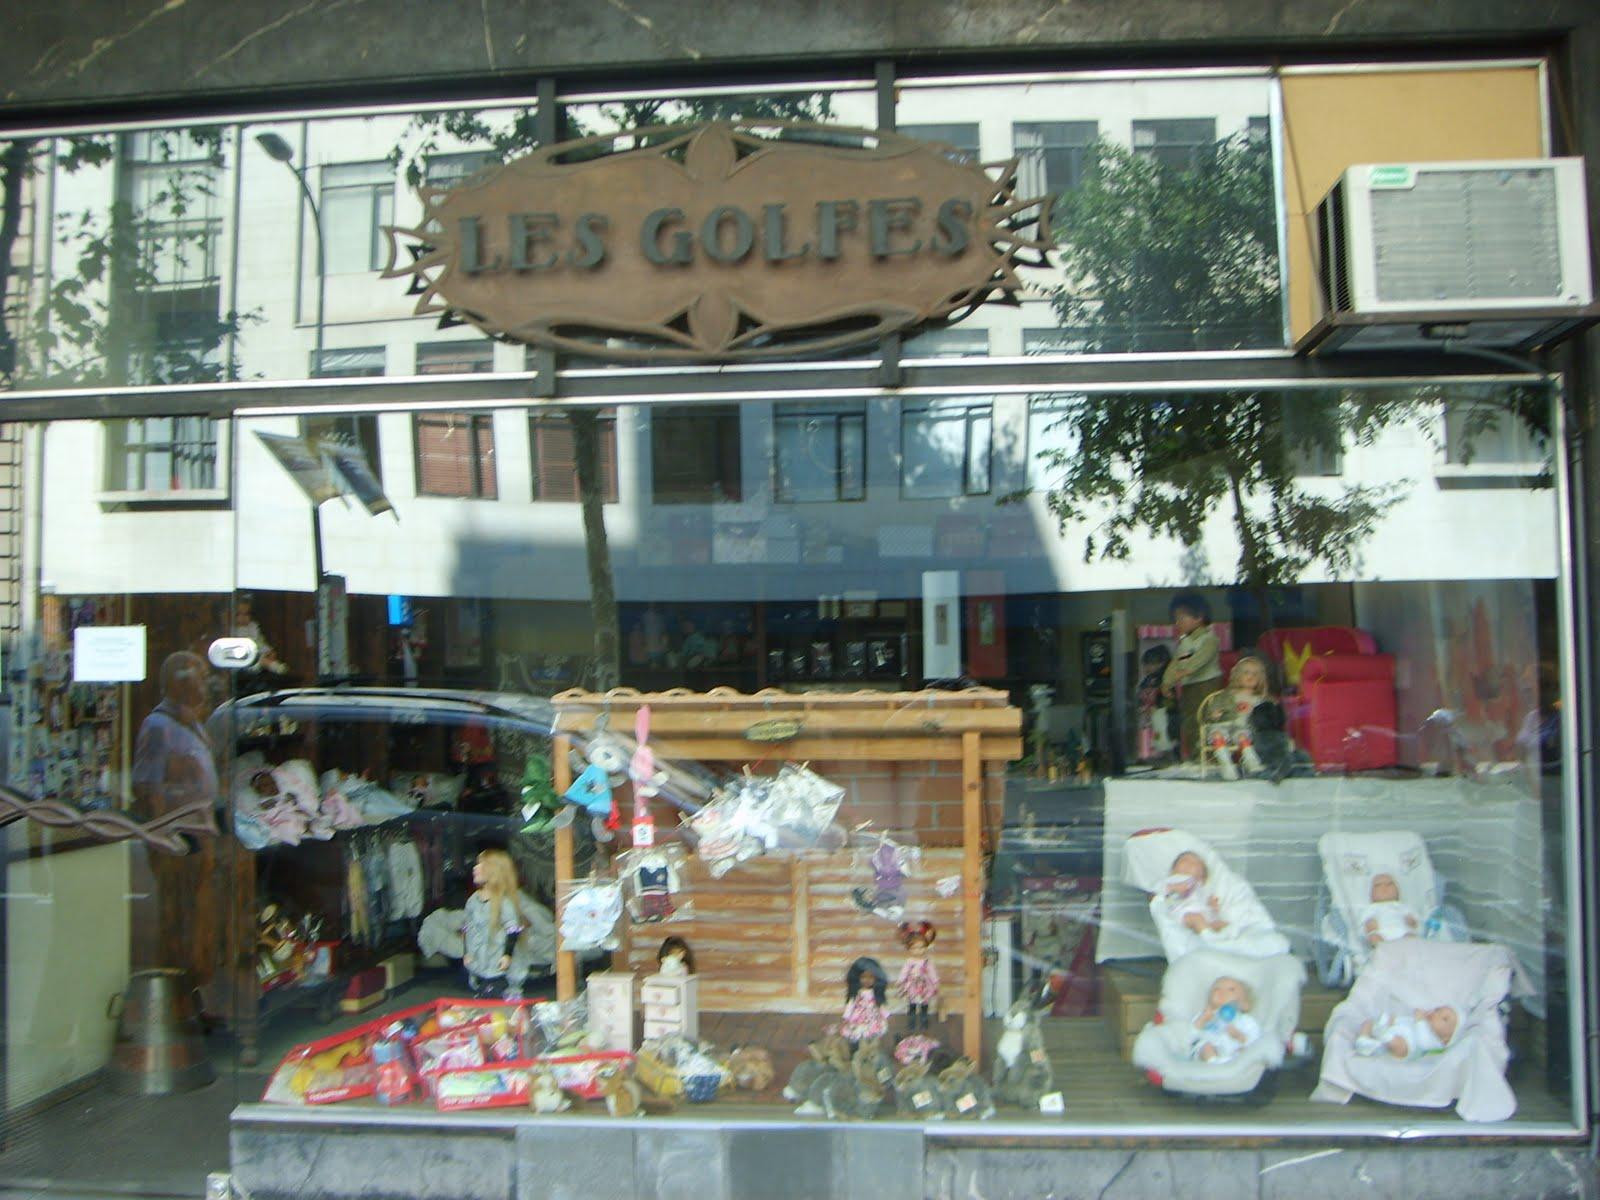 CAJA DE KEKAS: Tiendas de muñecas en Barcelona